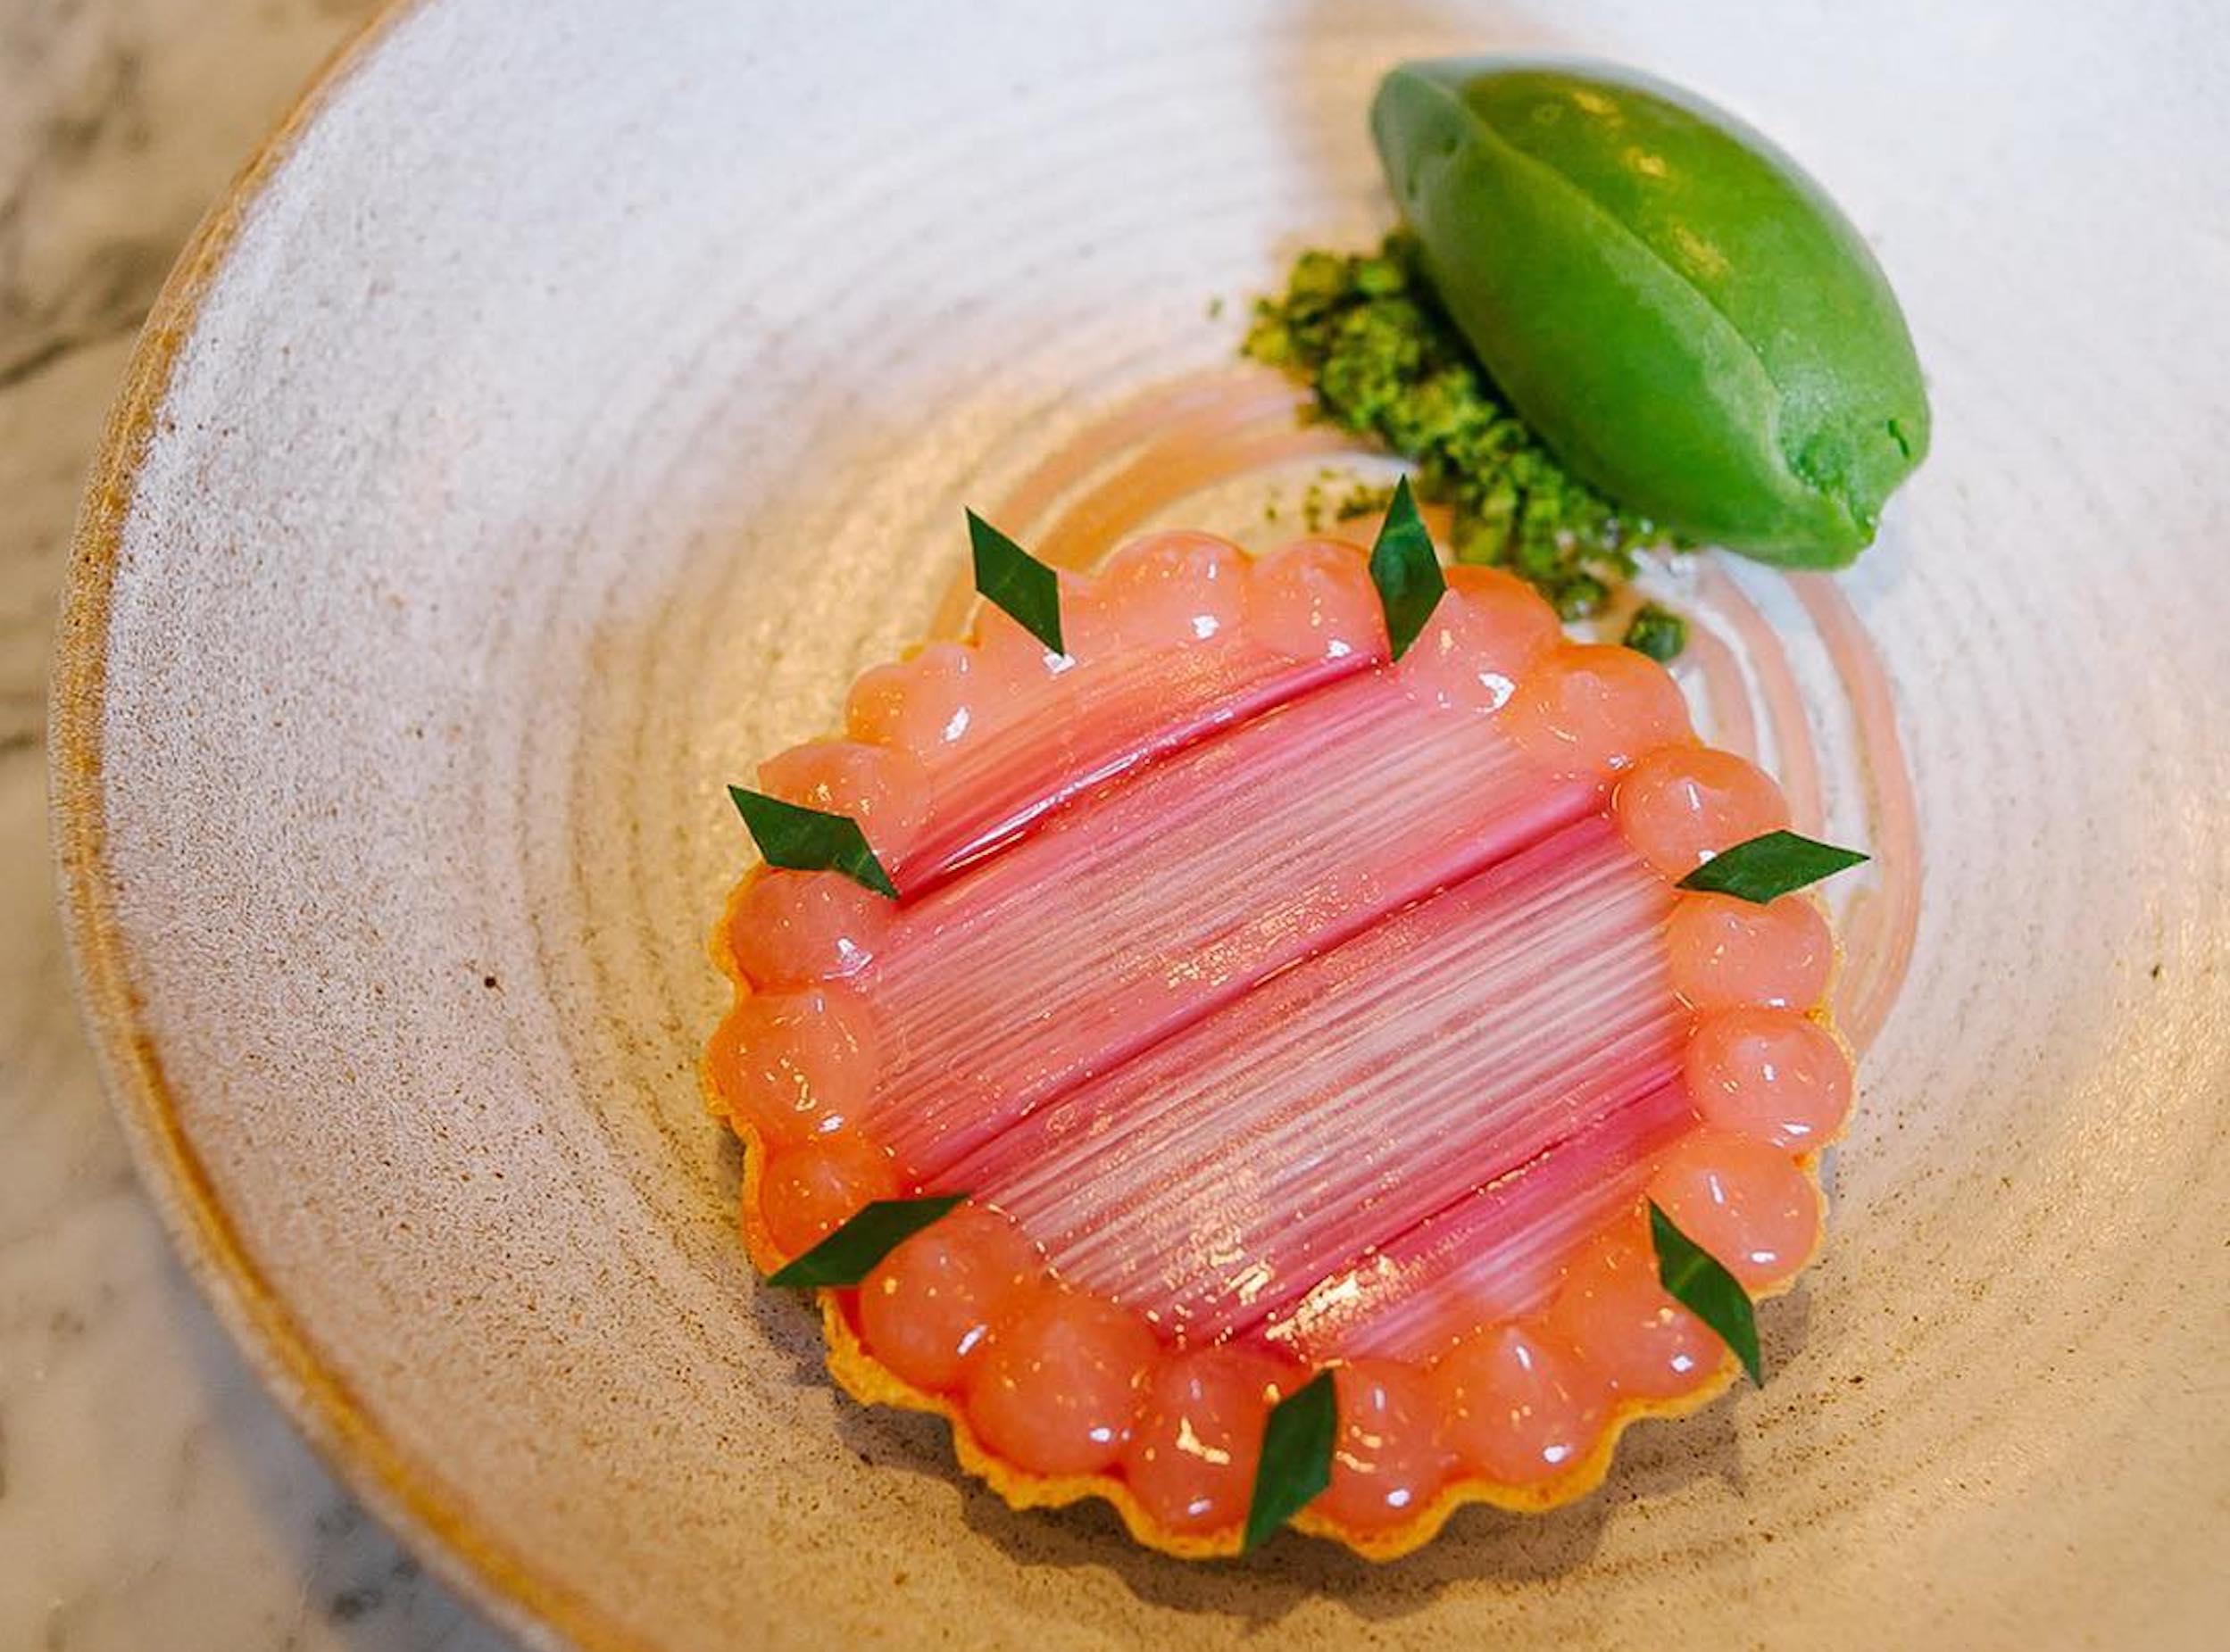 London restaurants love seasonal fruit rhubarb right now